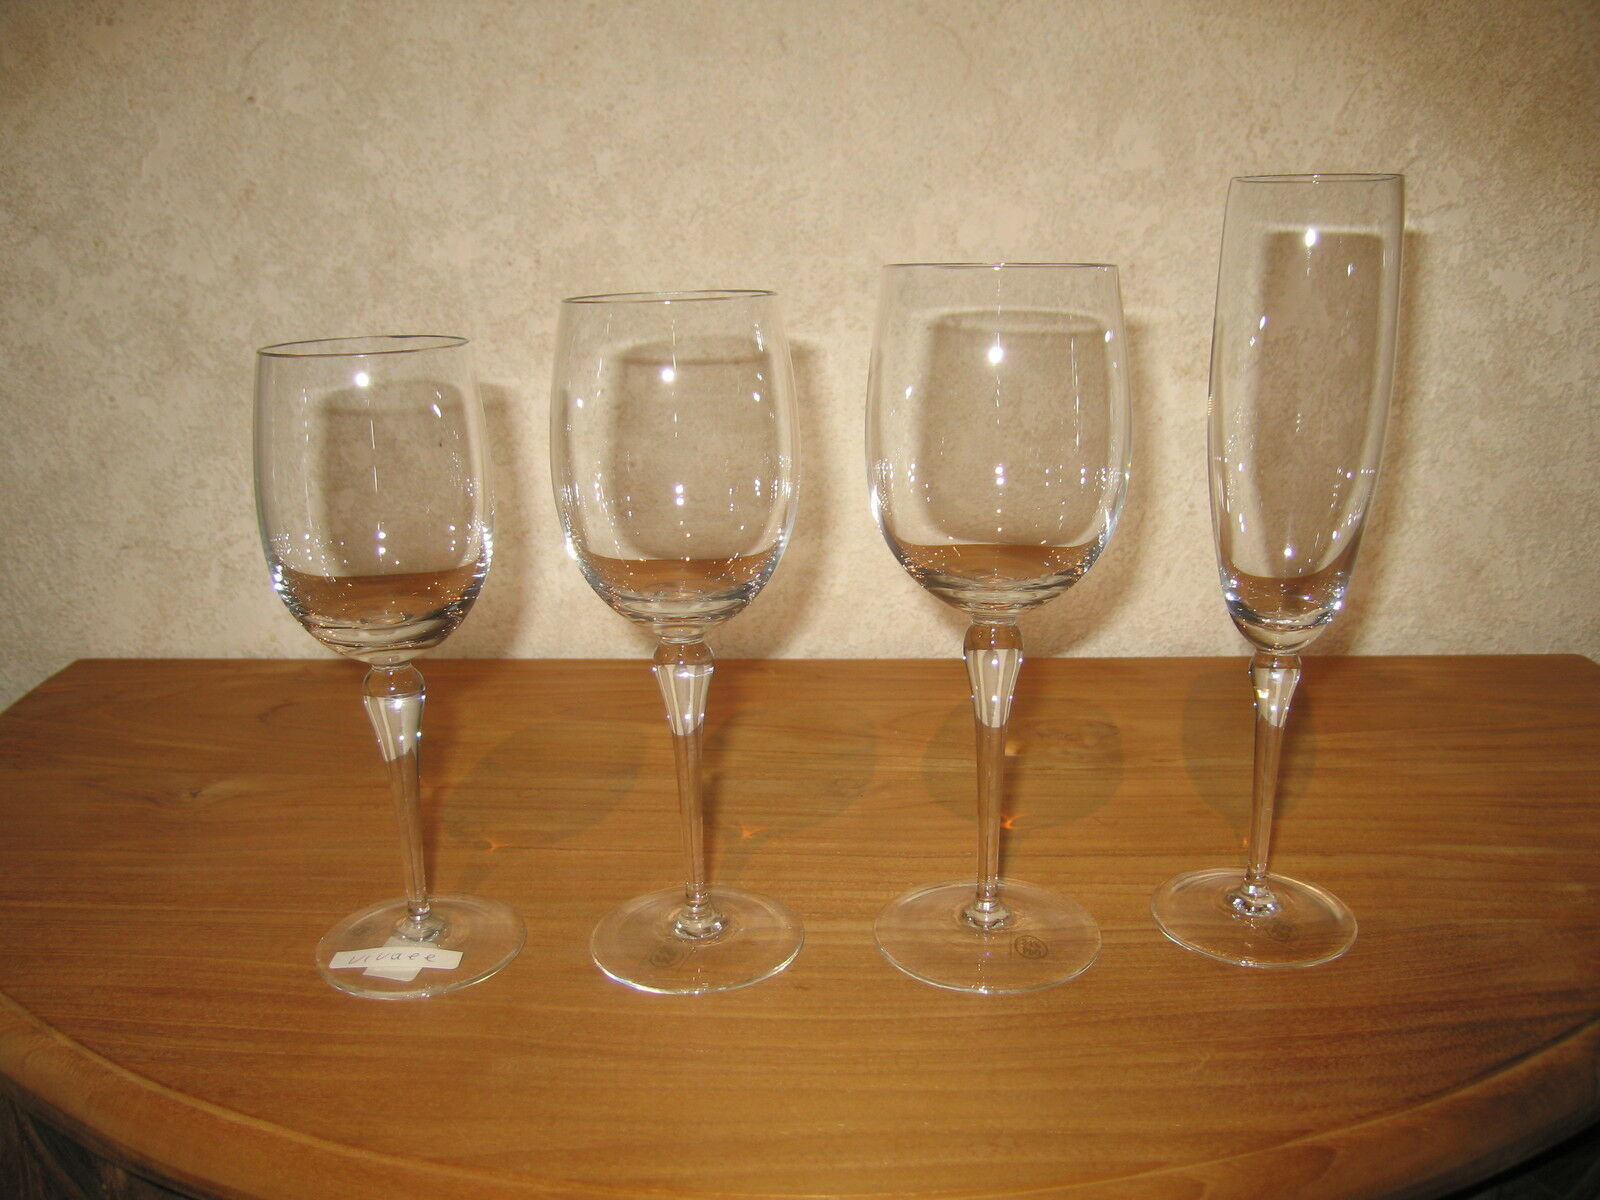 BOUSSU NEW VIVACE Set 8 Verres Glasses